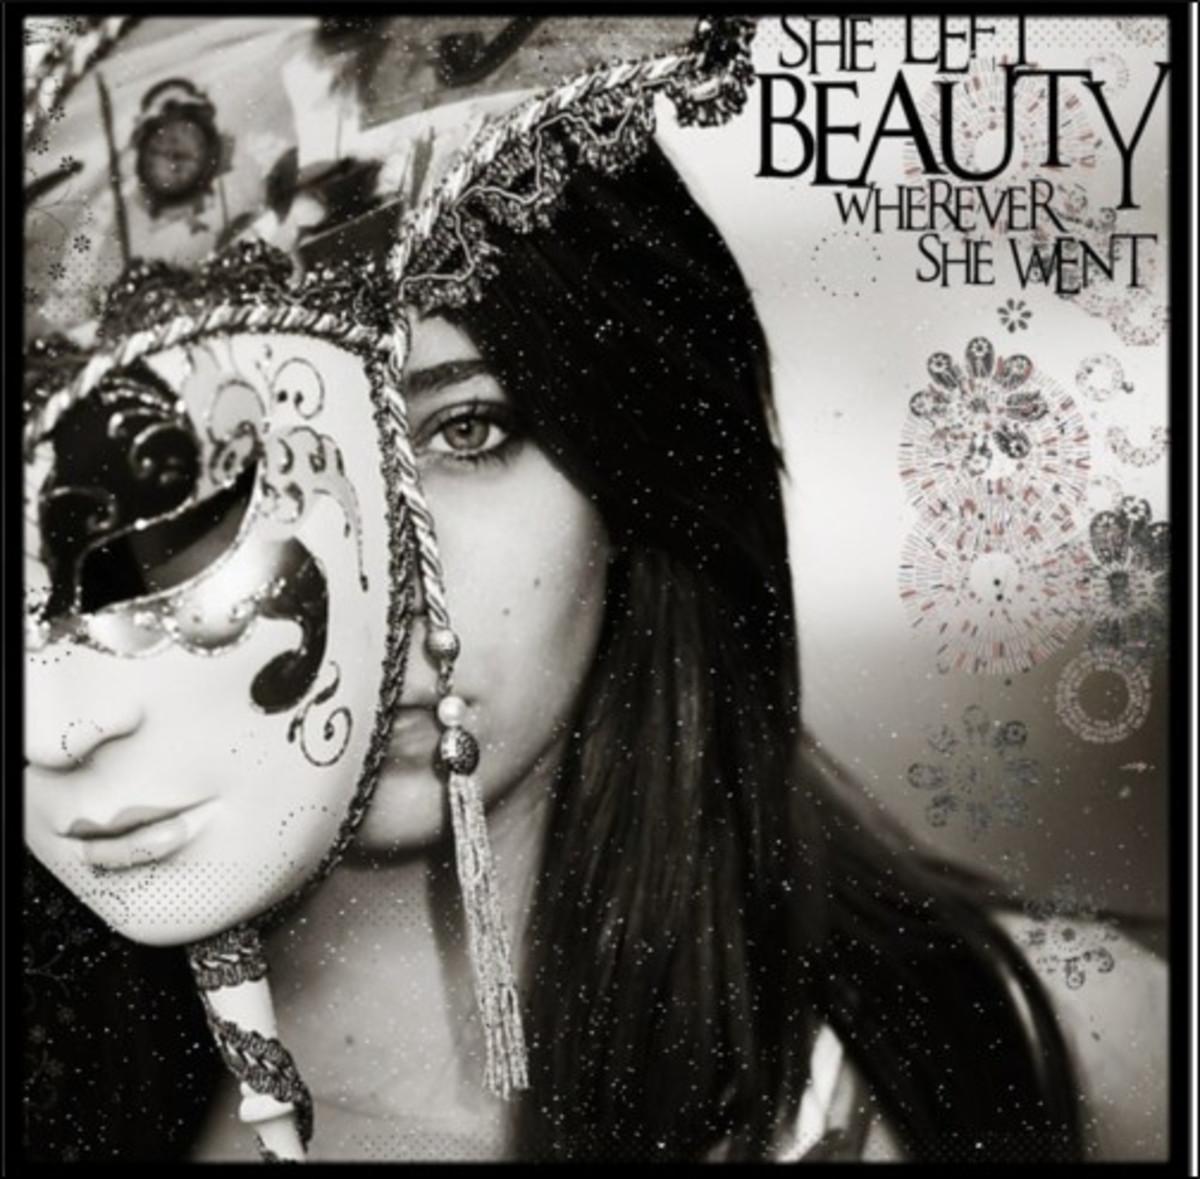 She Left Beauty Where Ever She Went